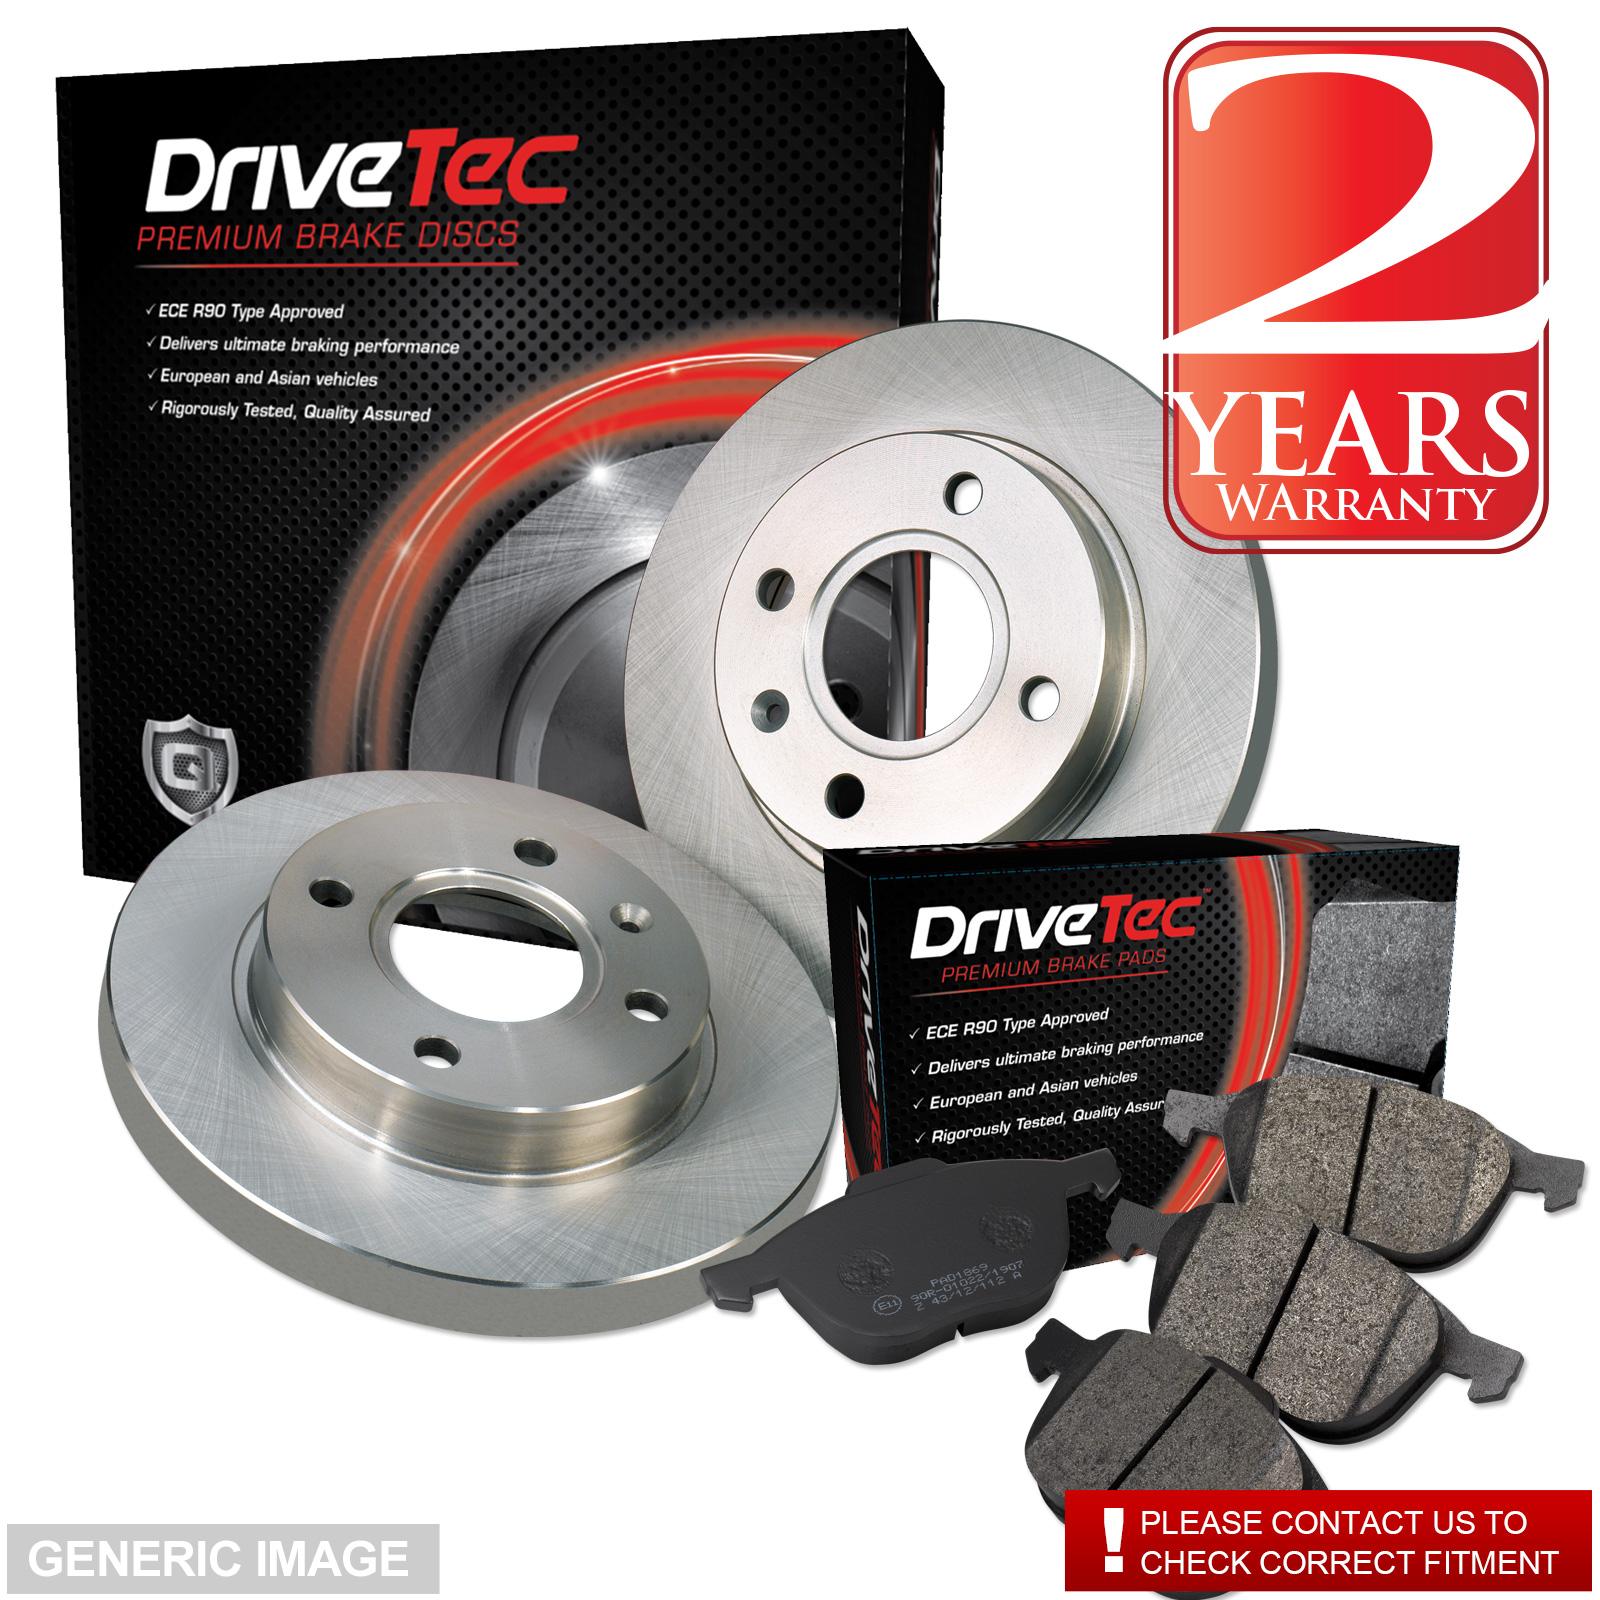 Vauxhall Insignia 2.0 CDTi 158 Drivetec Rear Brake Pads 292mm For Solid Discs